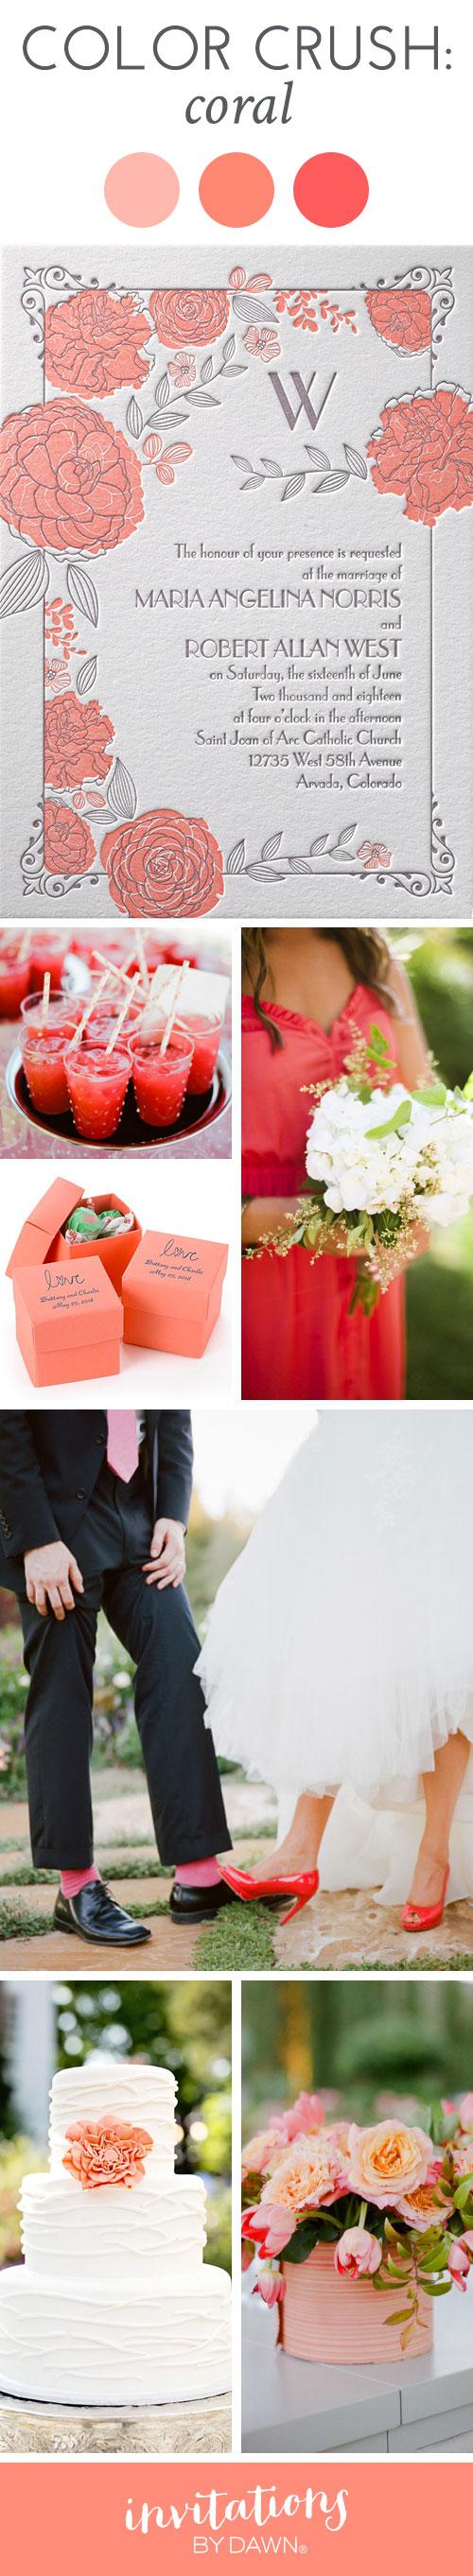 Color Crush: Coral | Pink Wedding | Pinterest | Weddings